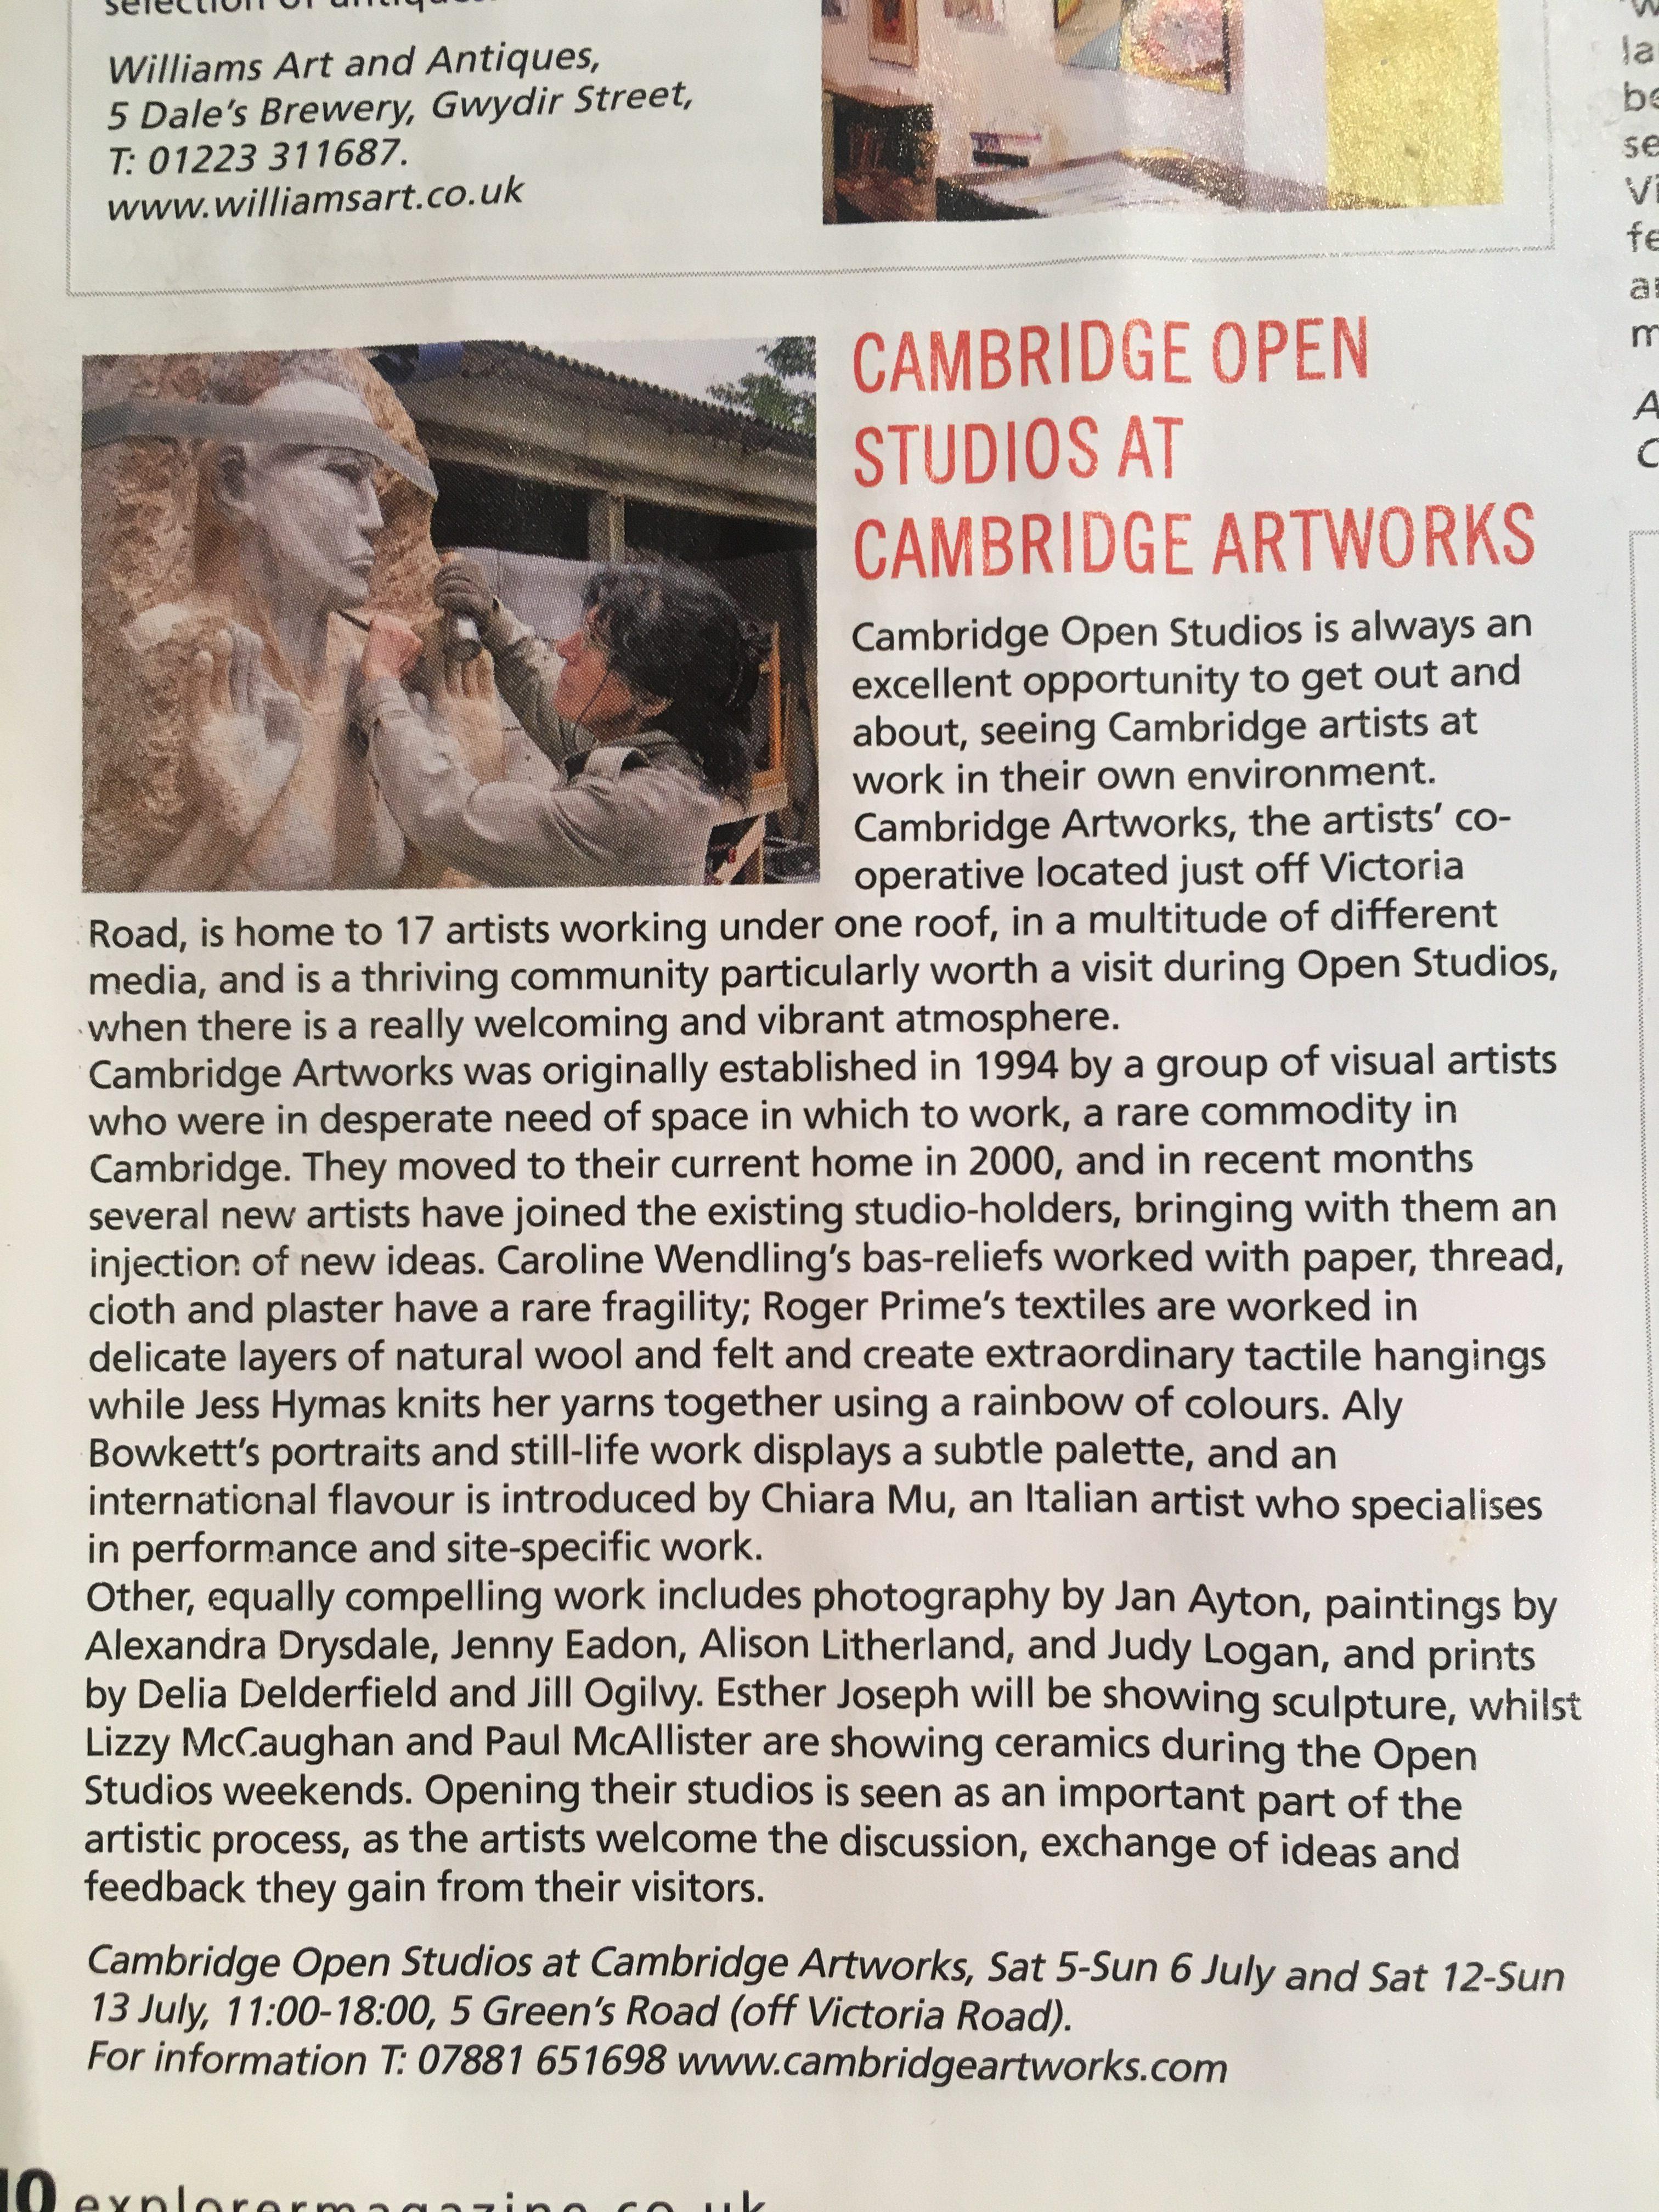 Cambridge Open Studios at Cambridge Artworks